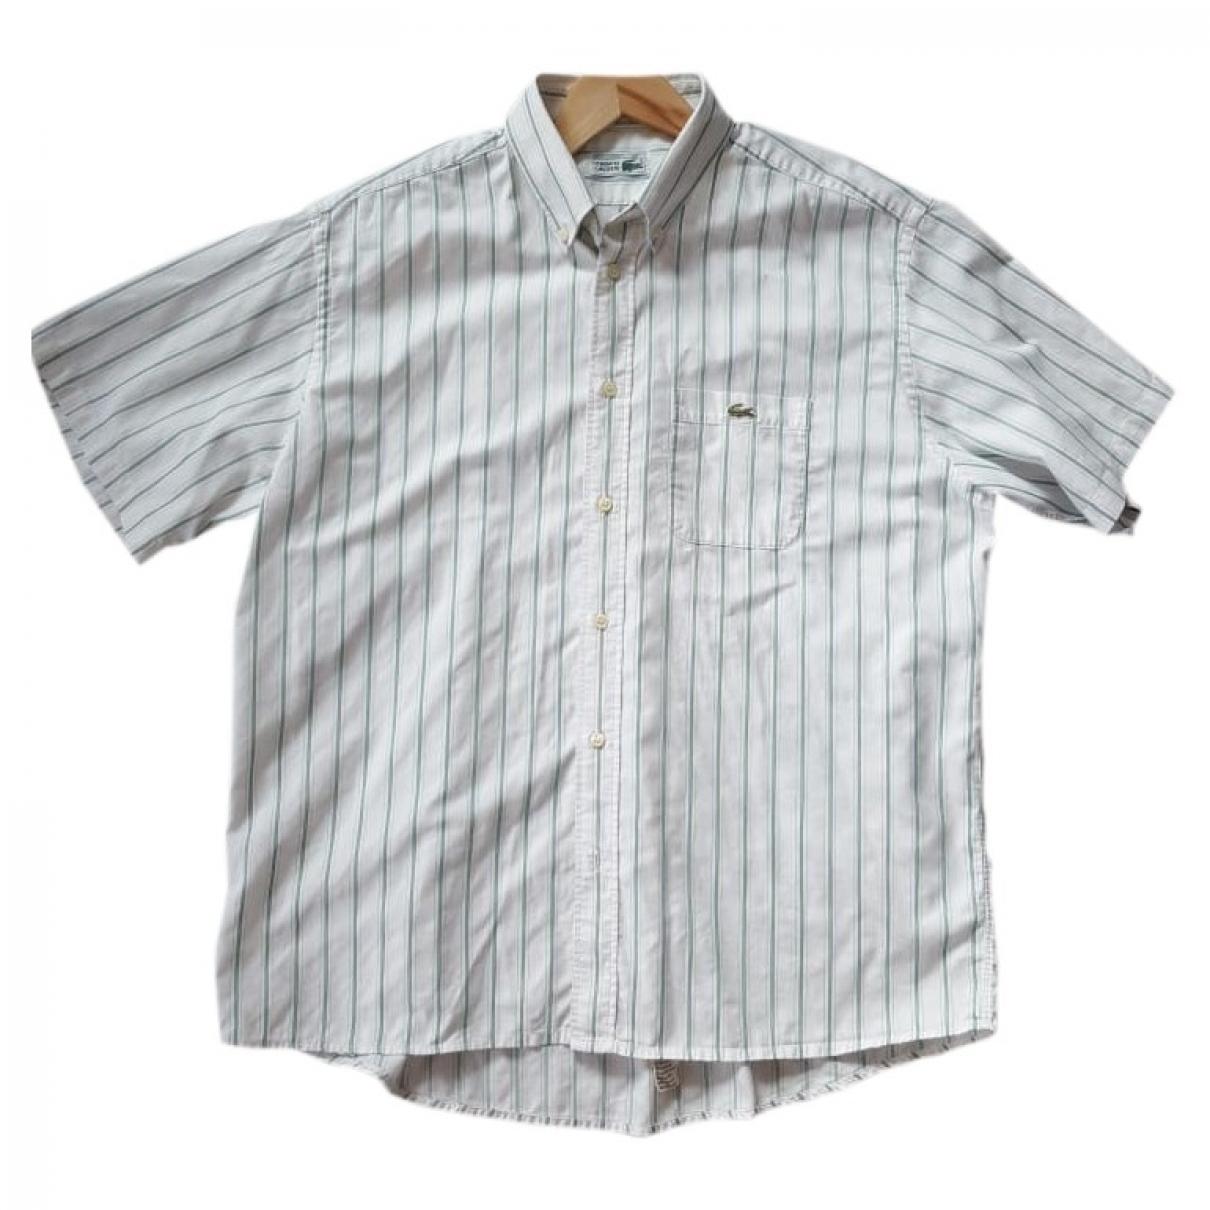 Lacoste \N White Cotton Shirts for Men XL International